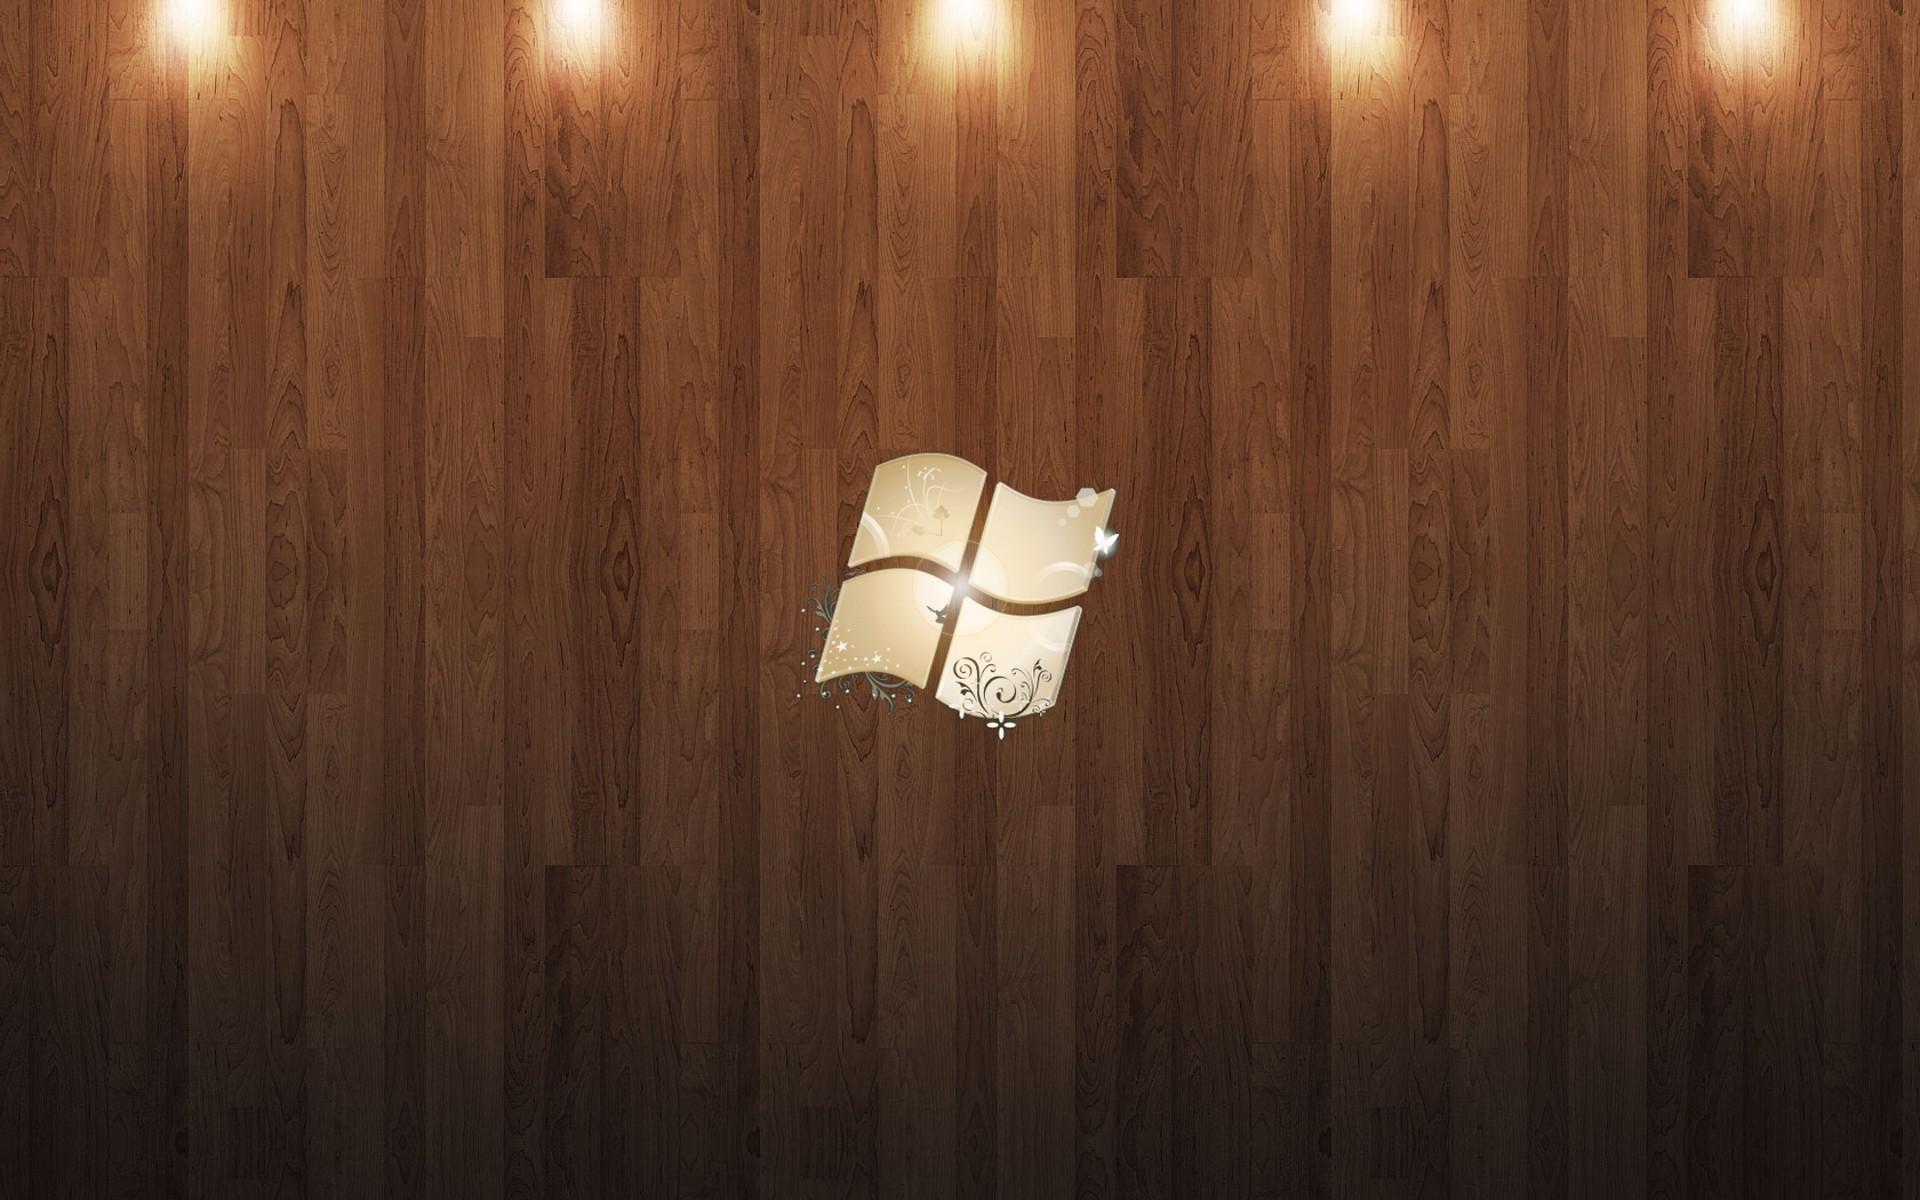 mauer holz logo licht beleuchtung stock decke hartholz 1920x1200 px bodenbelag holzboden laminatboden - Hartholz Oder Laminatboden